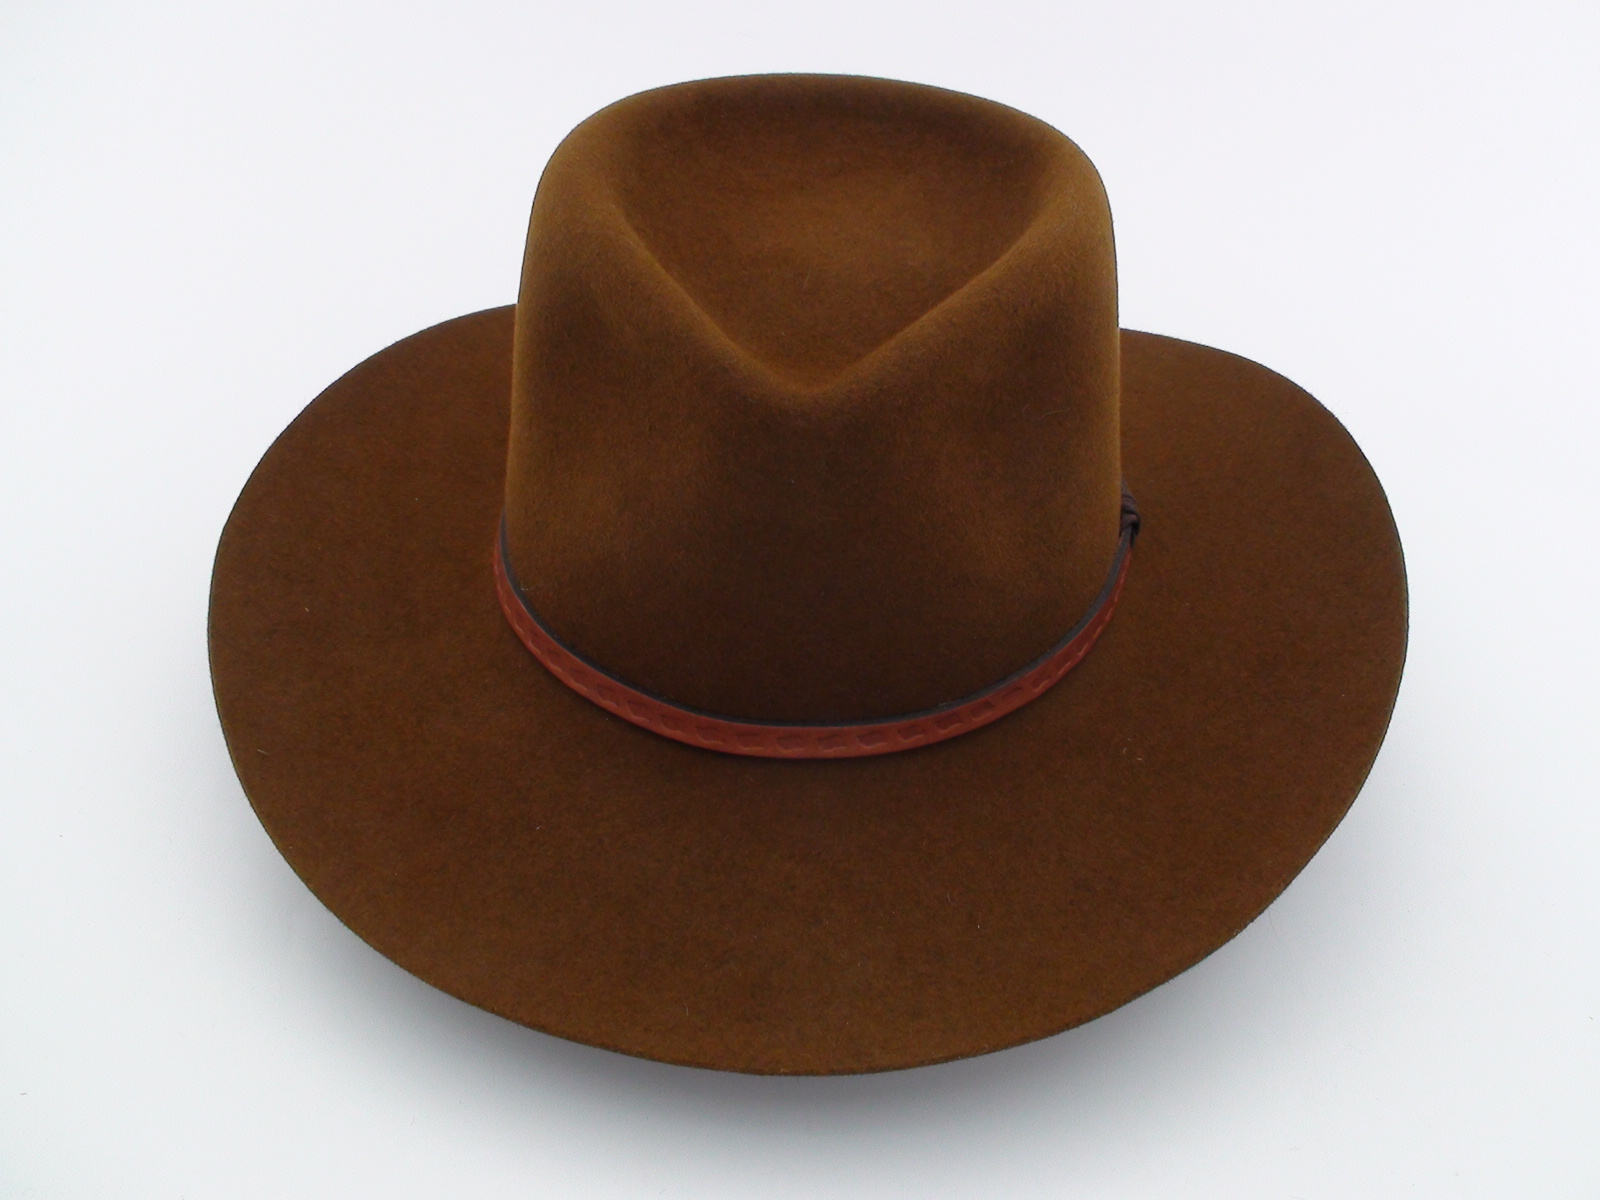 f37103ac309 Smithbilt Hats Brown Fur Felt Western Cowboy Hat - Bernard Hats